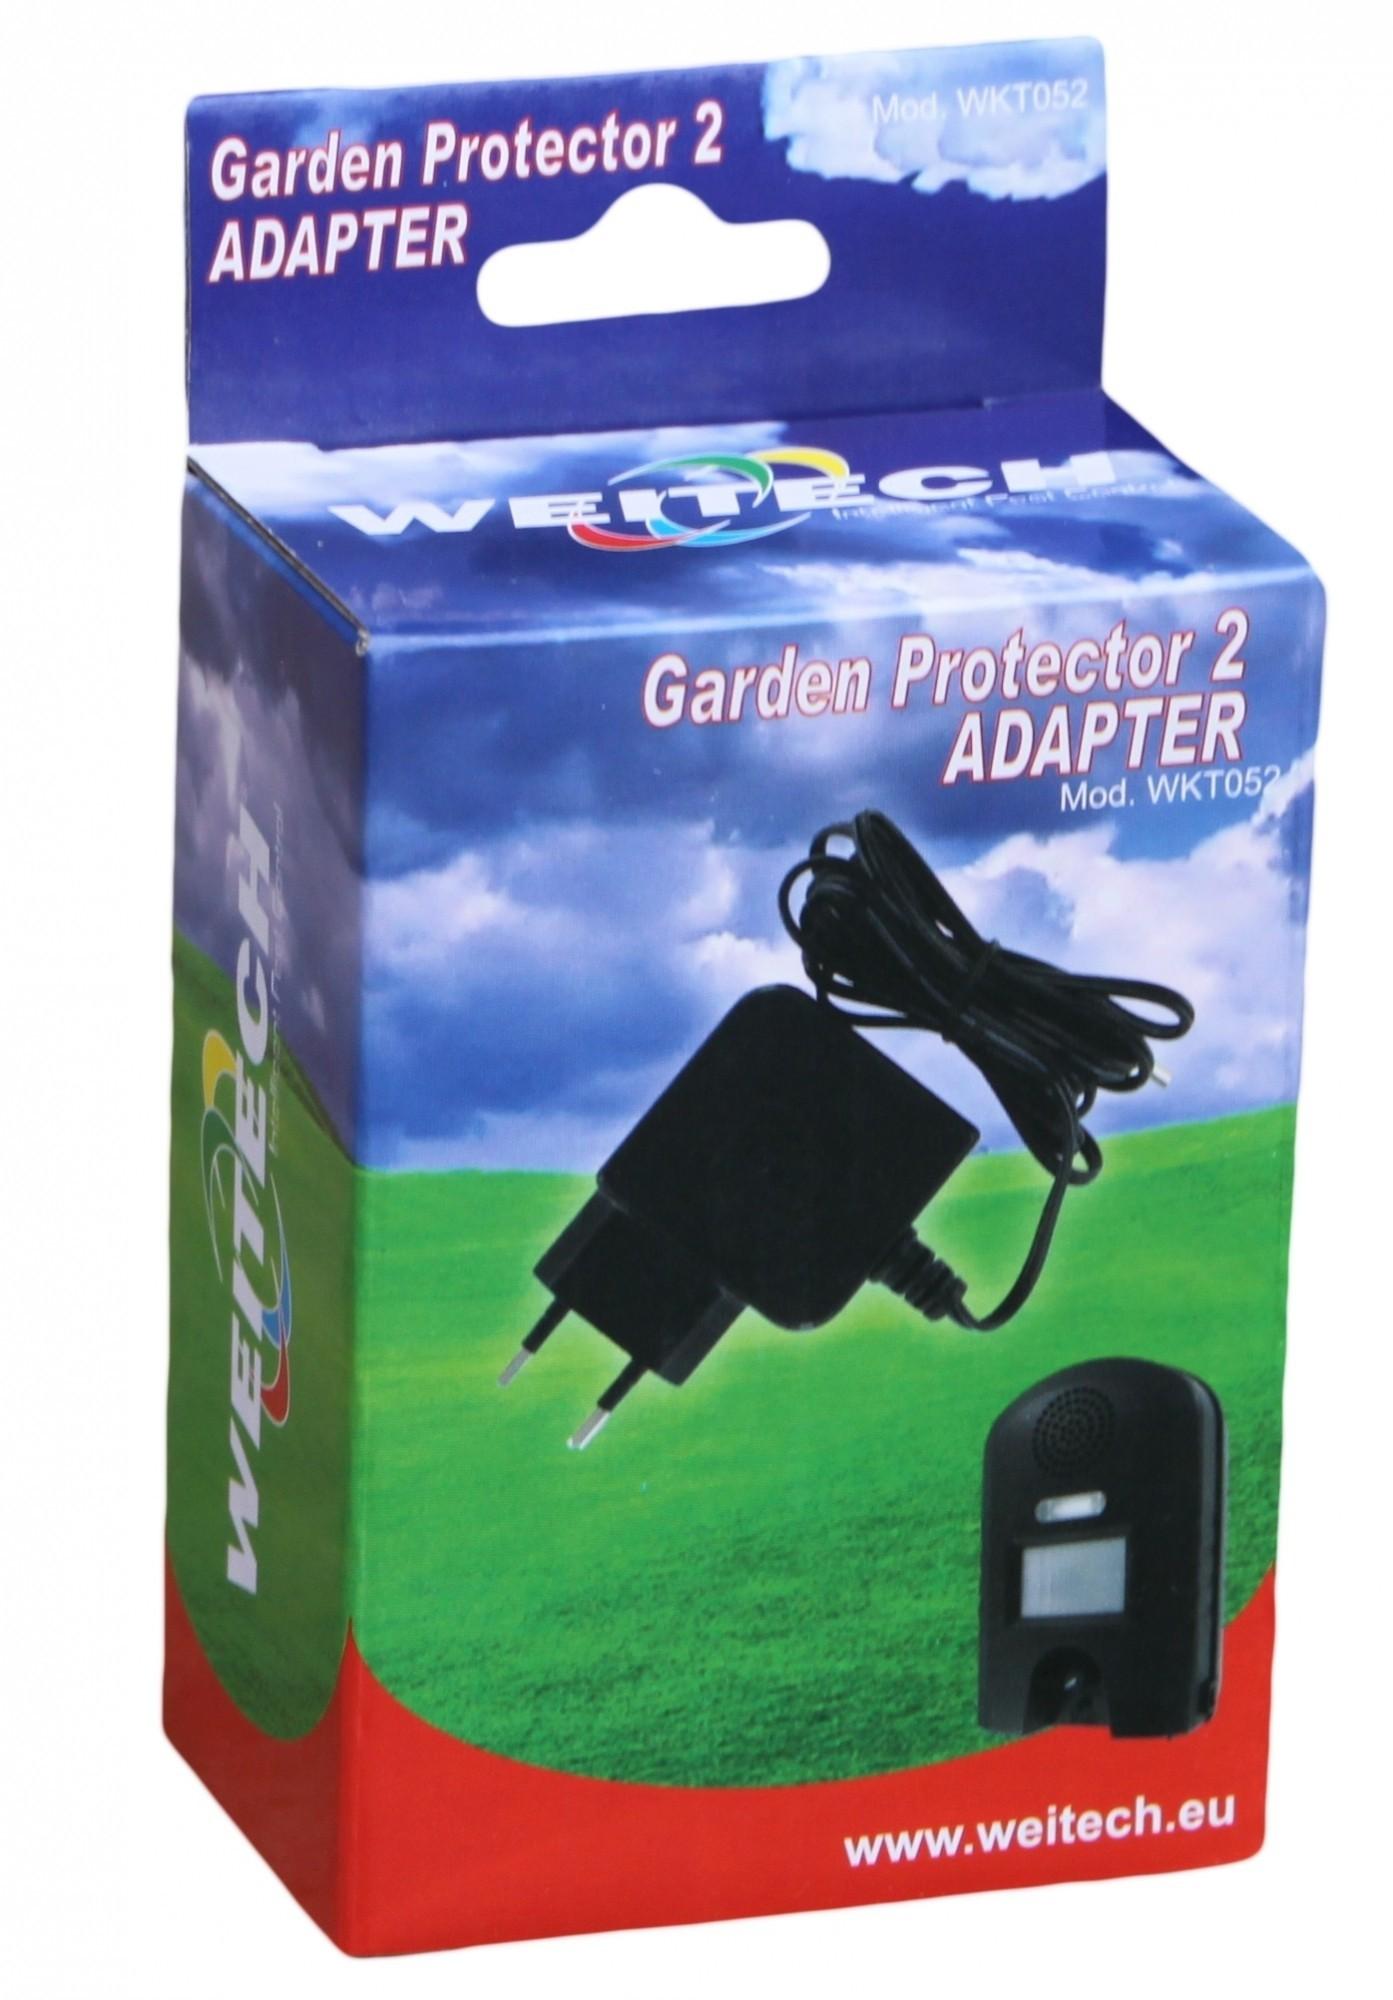 Adapter Weitech garden protector 2